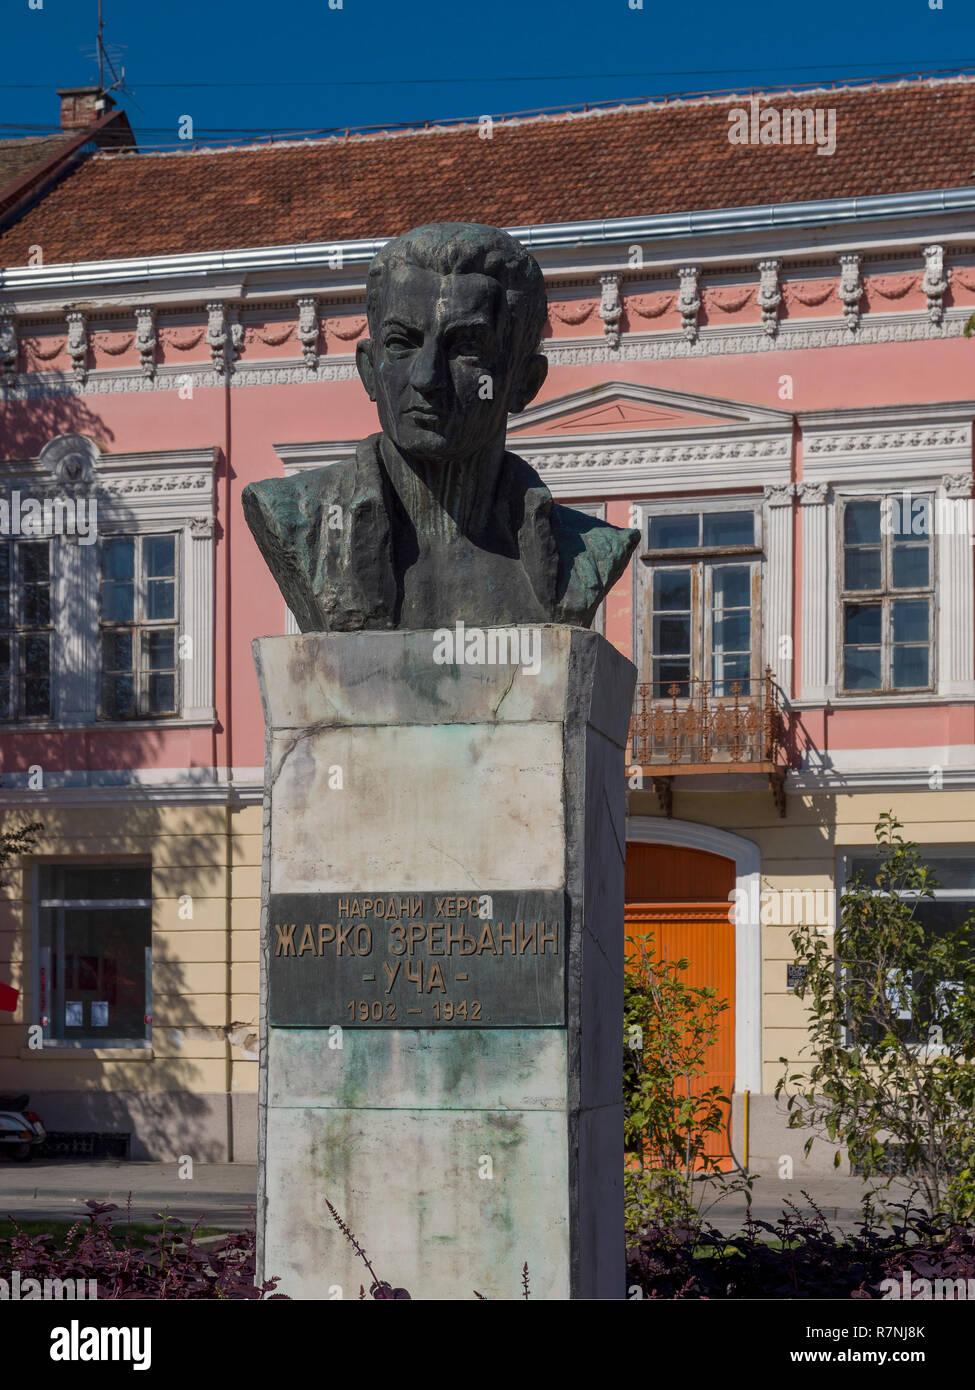 Bust in Ruski Park, Vrsac, Vojvodina, Serbia, Europe - Stock Image